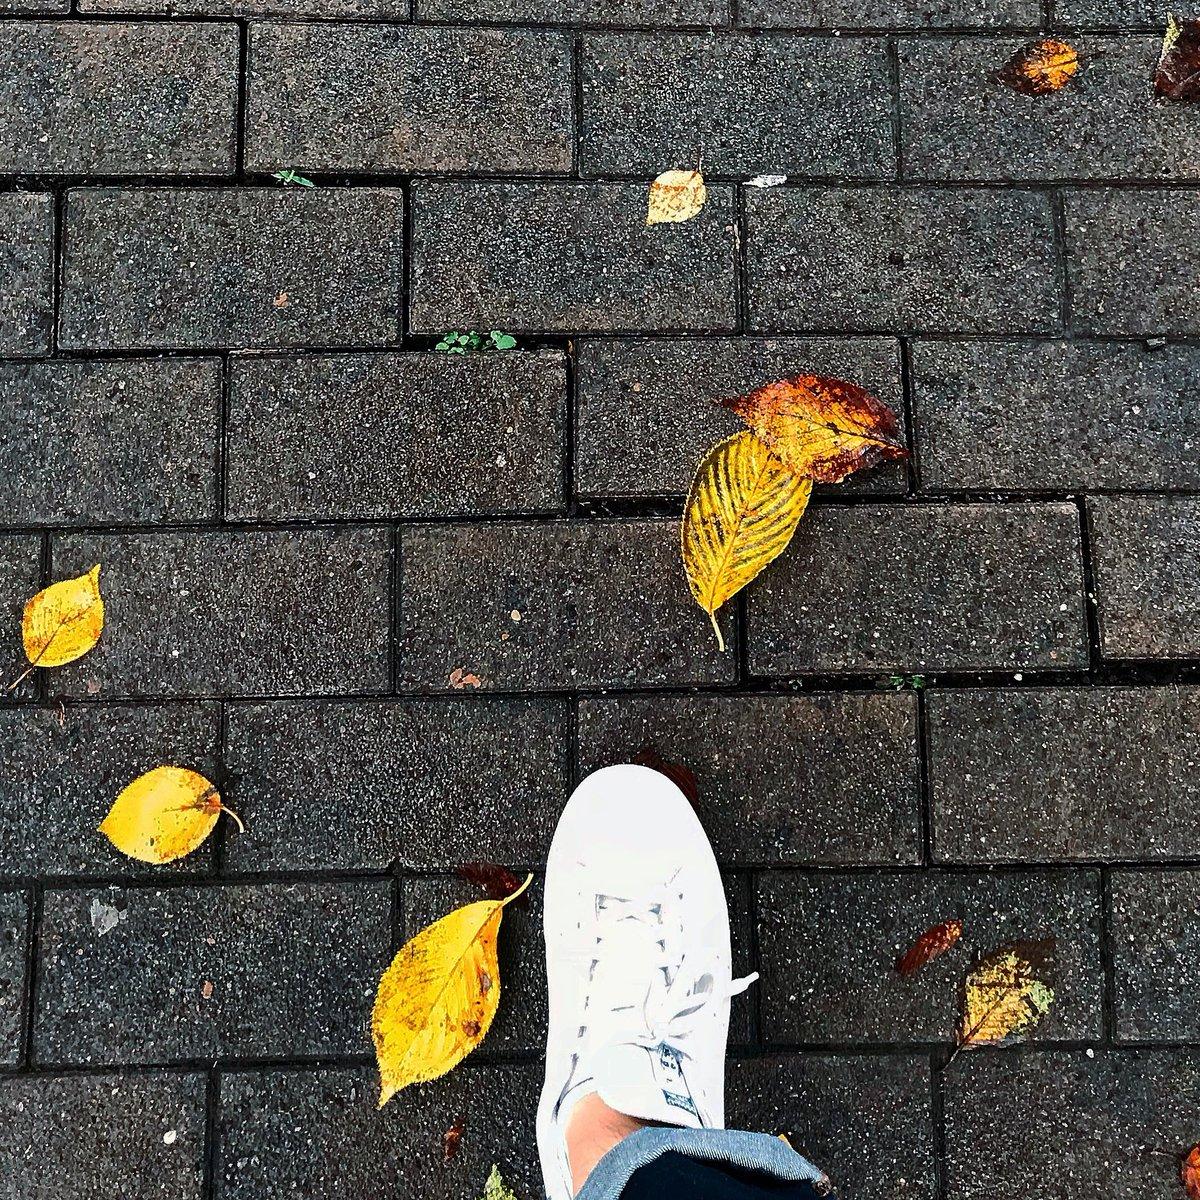 The start of autumn with chilly rainy day  #StanSmith #Navy #adidas #スタンスミス #ネイビー #アディダス #kicks #sneaker #スニーカー #WhereIStand #足元くらぶ pic.twitter.com/mVb1oEqRbb